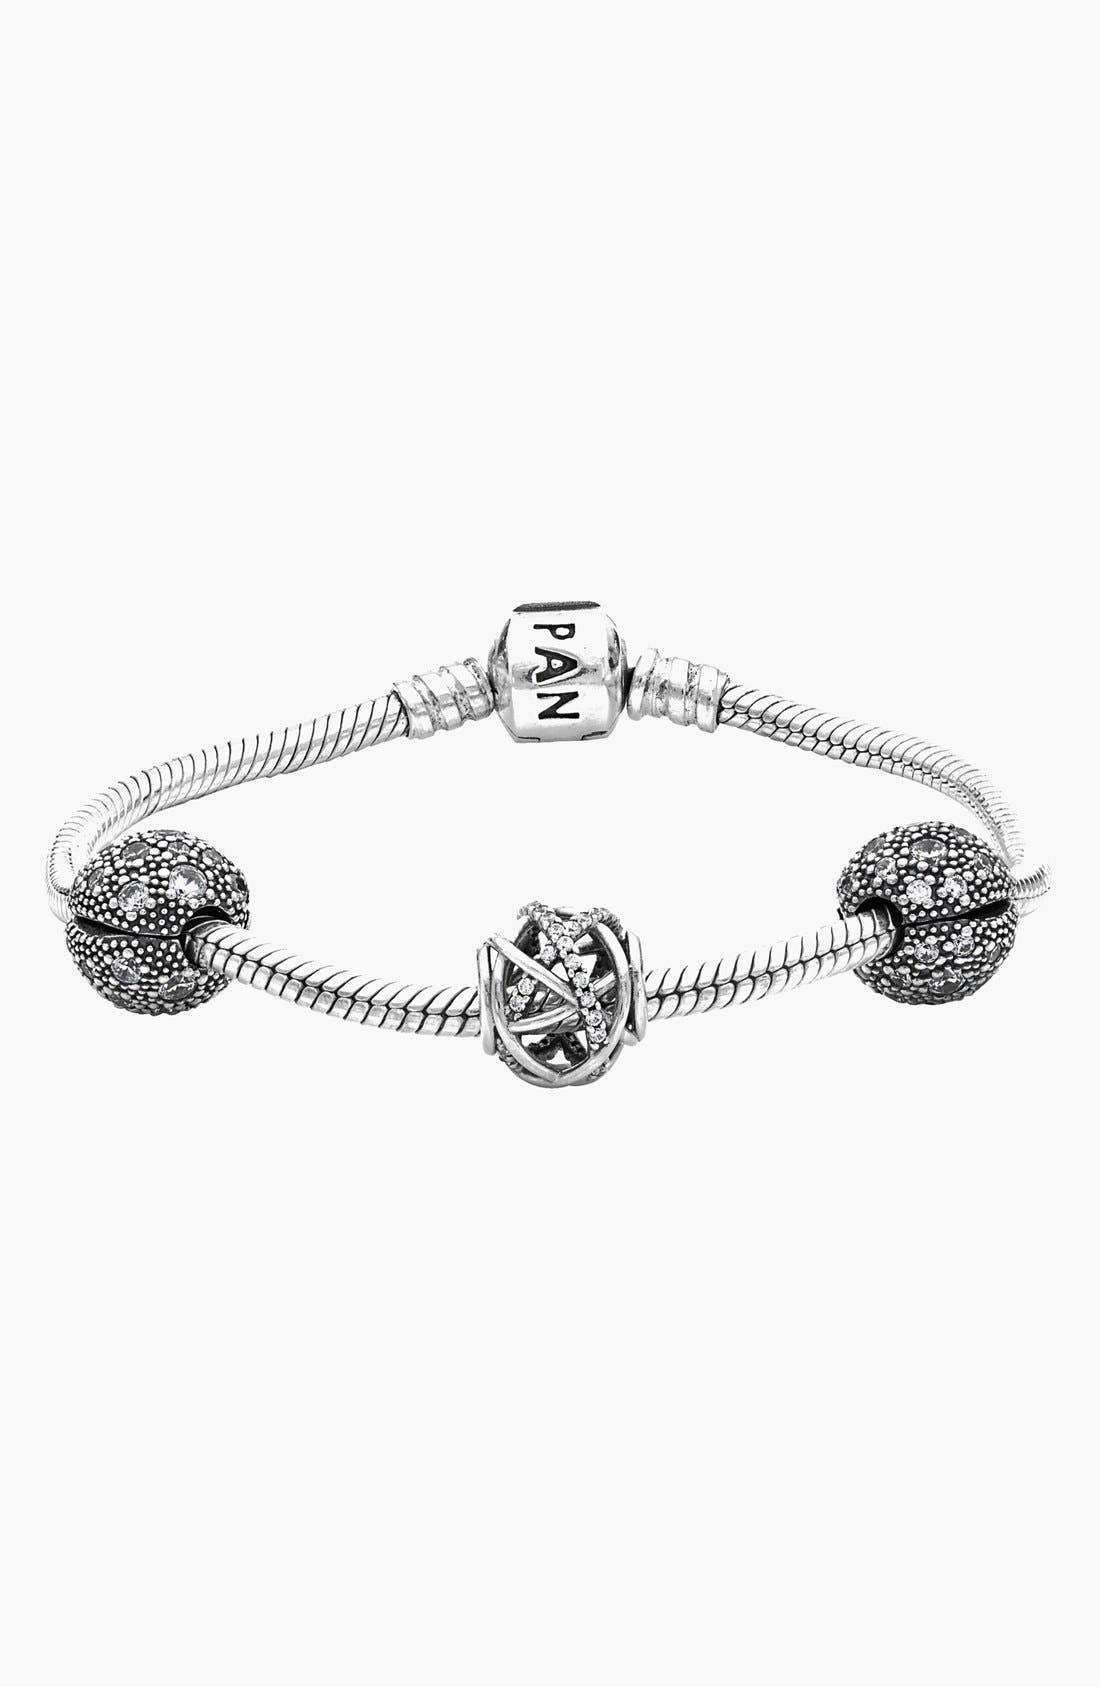 Main Image - PANDORA 'Stargazer' Bracelet and Charms